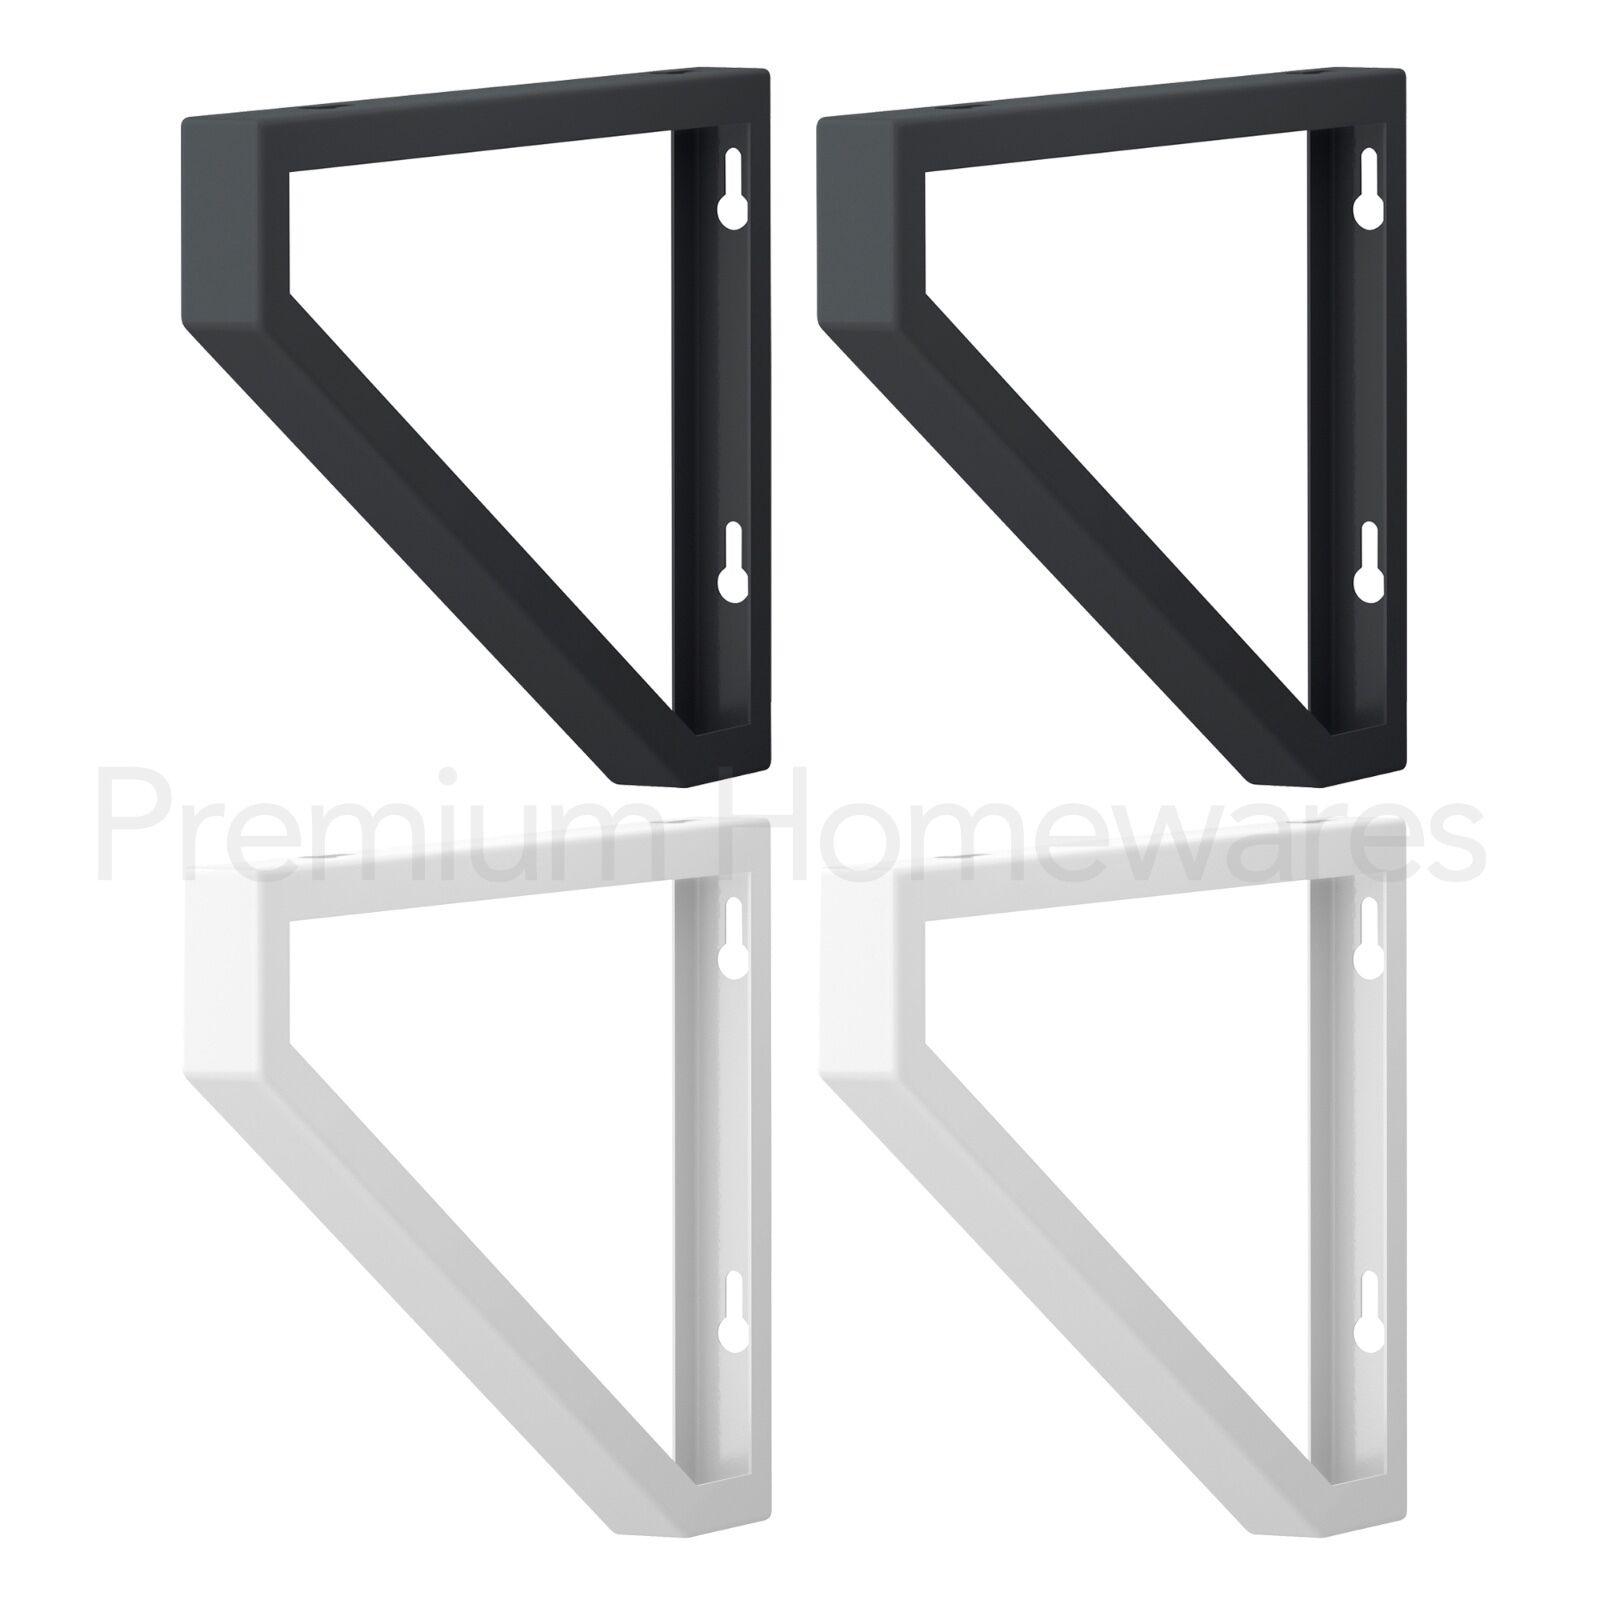 2 x ikea ekby lerberg metal wall brackets for 19cm 28cm for Ikea metal wall shelf